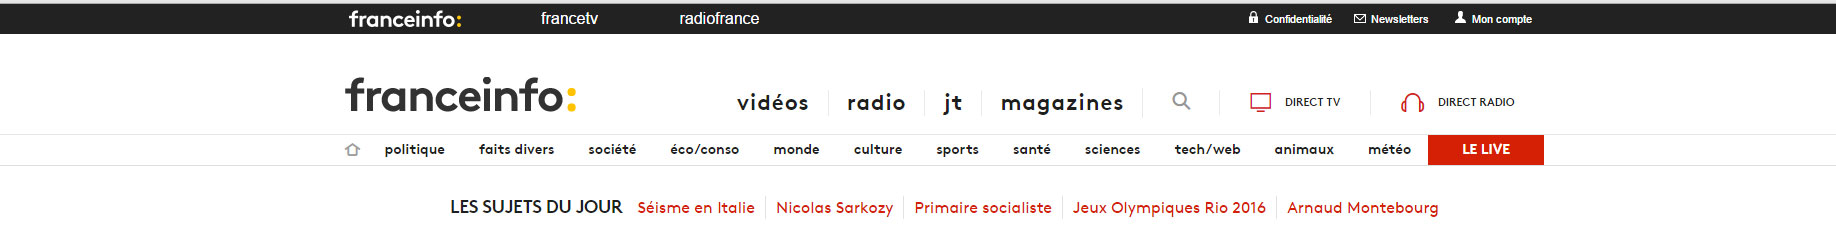 header-france-info